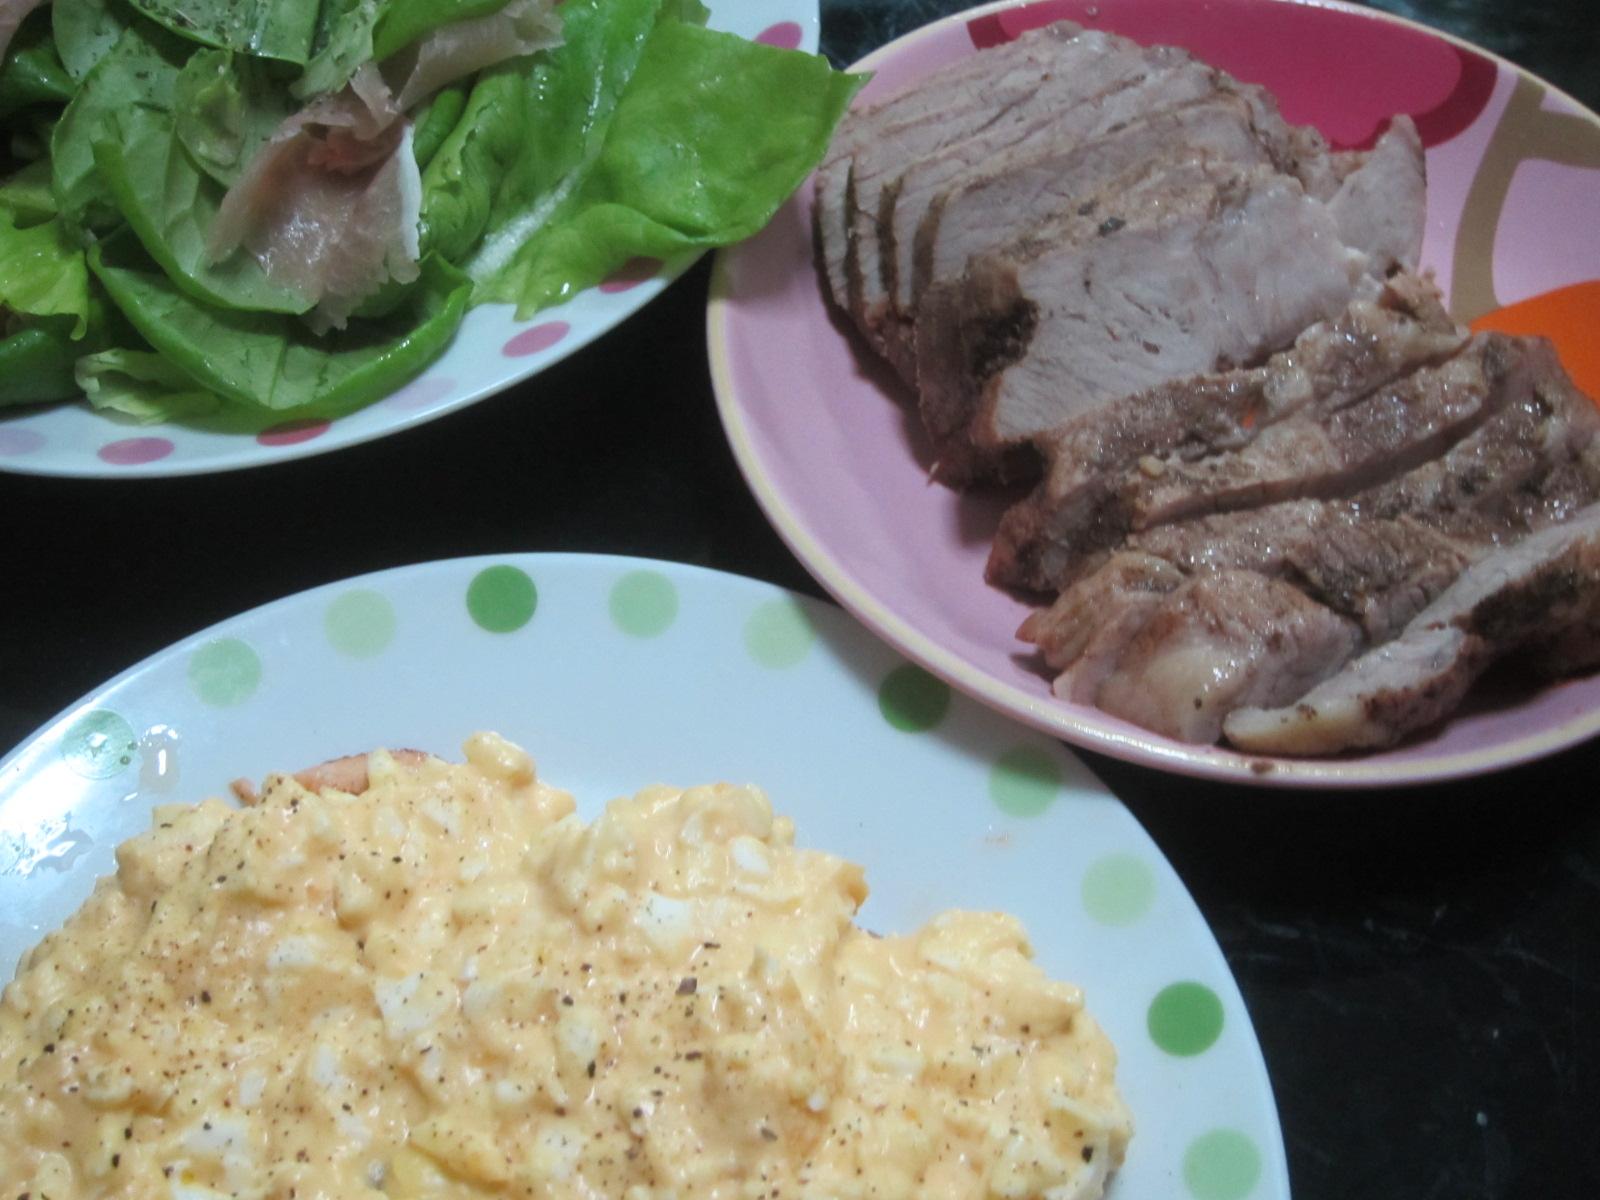 IMG 0010 - 豚肉のコーラ煮に挑戦してみた、ていうかスゲー美味しかった